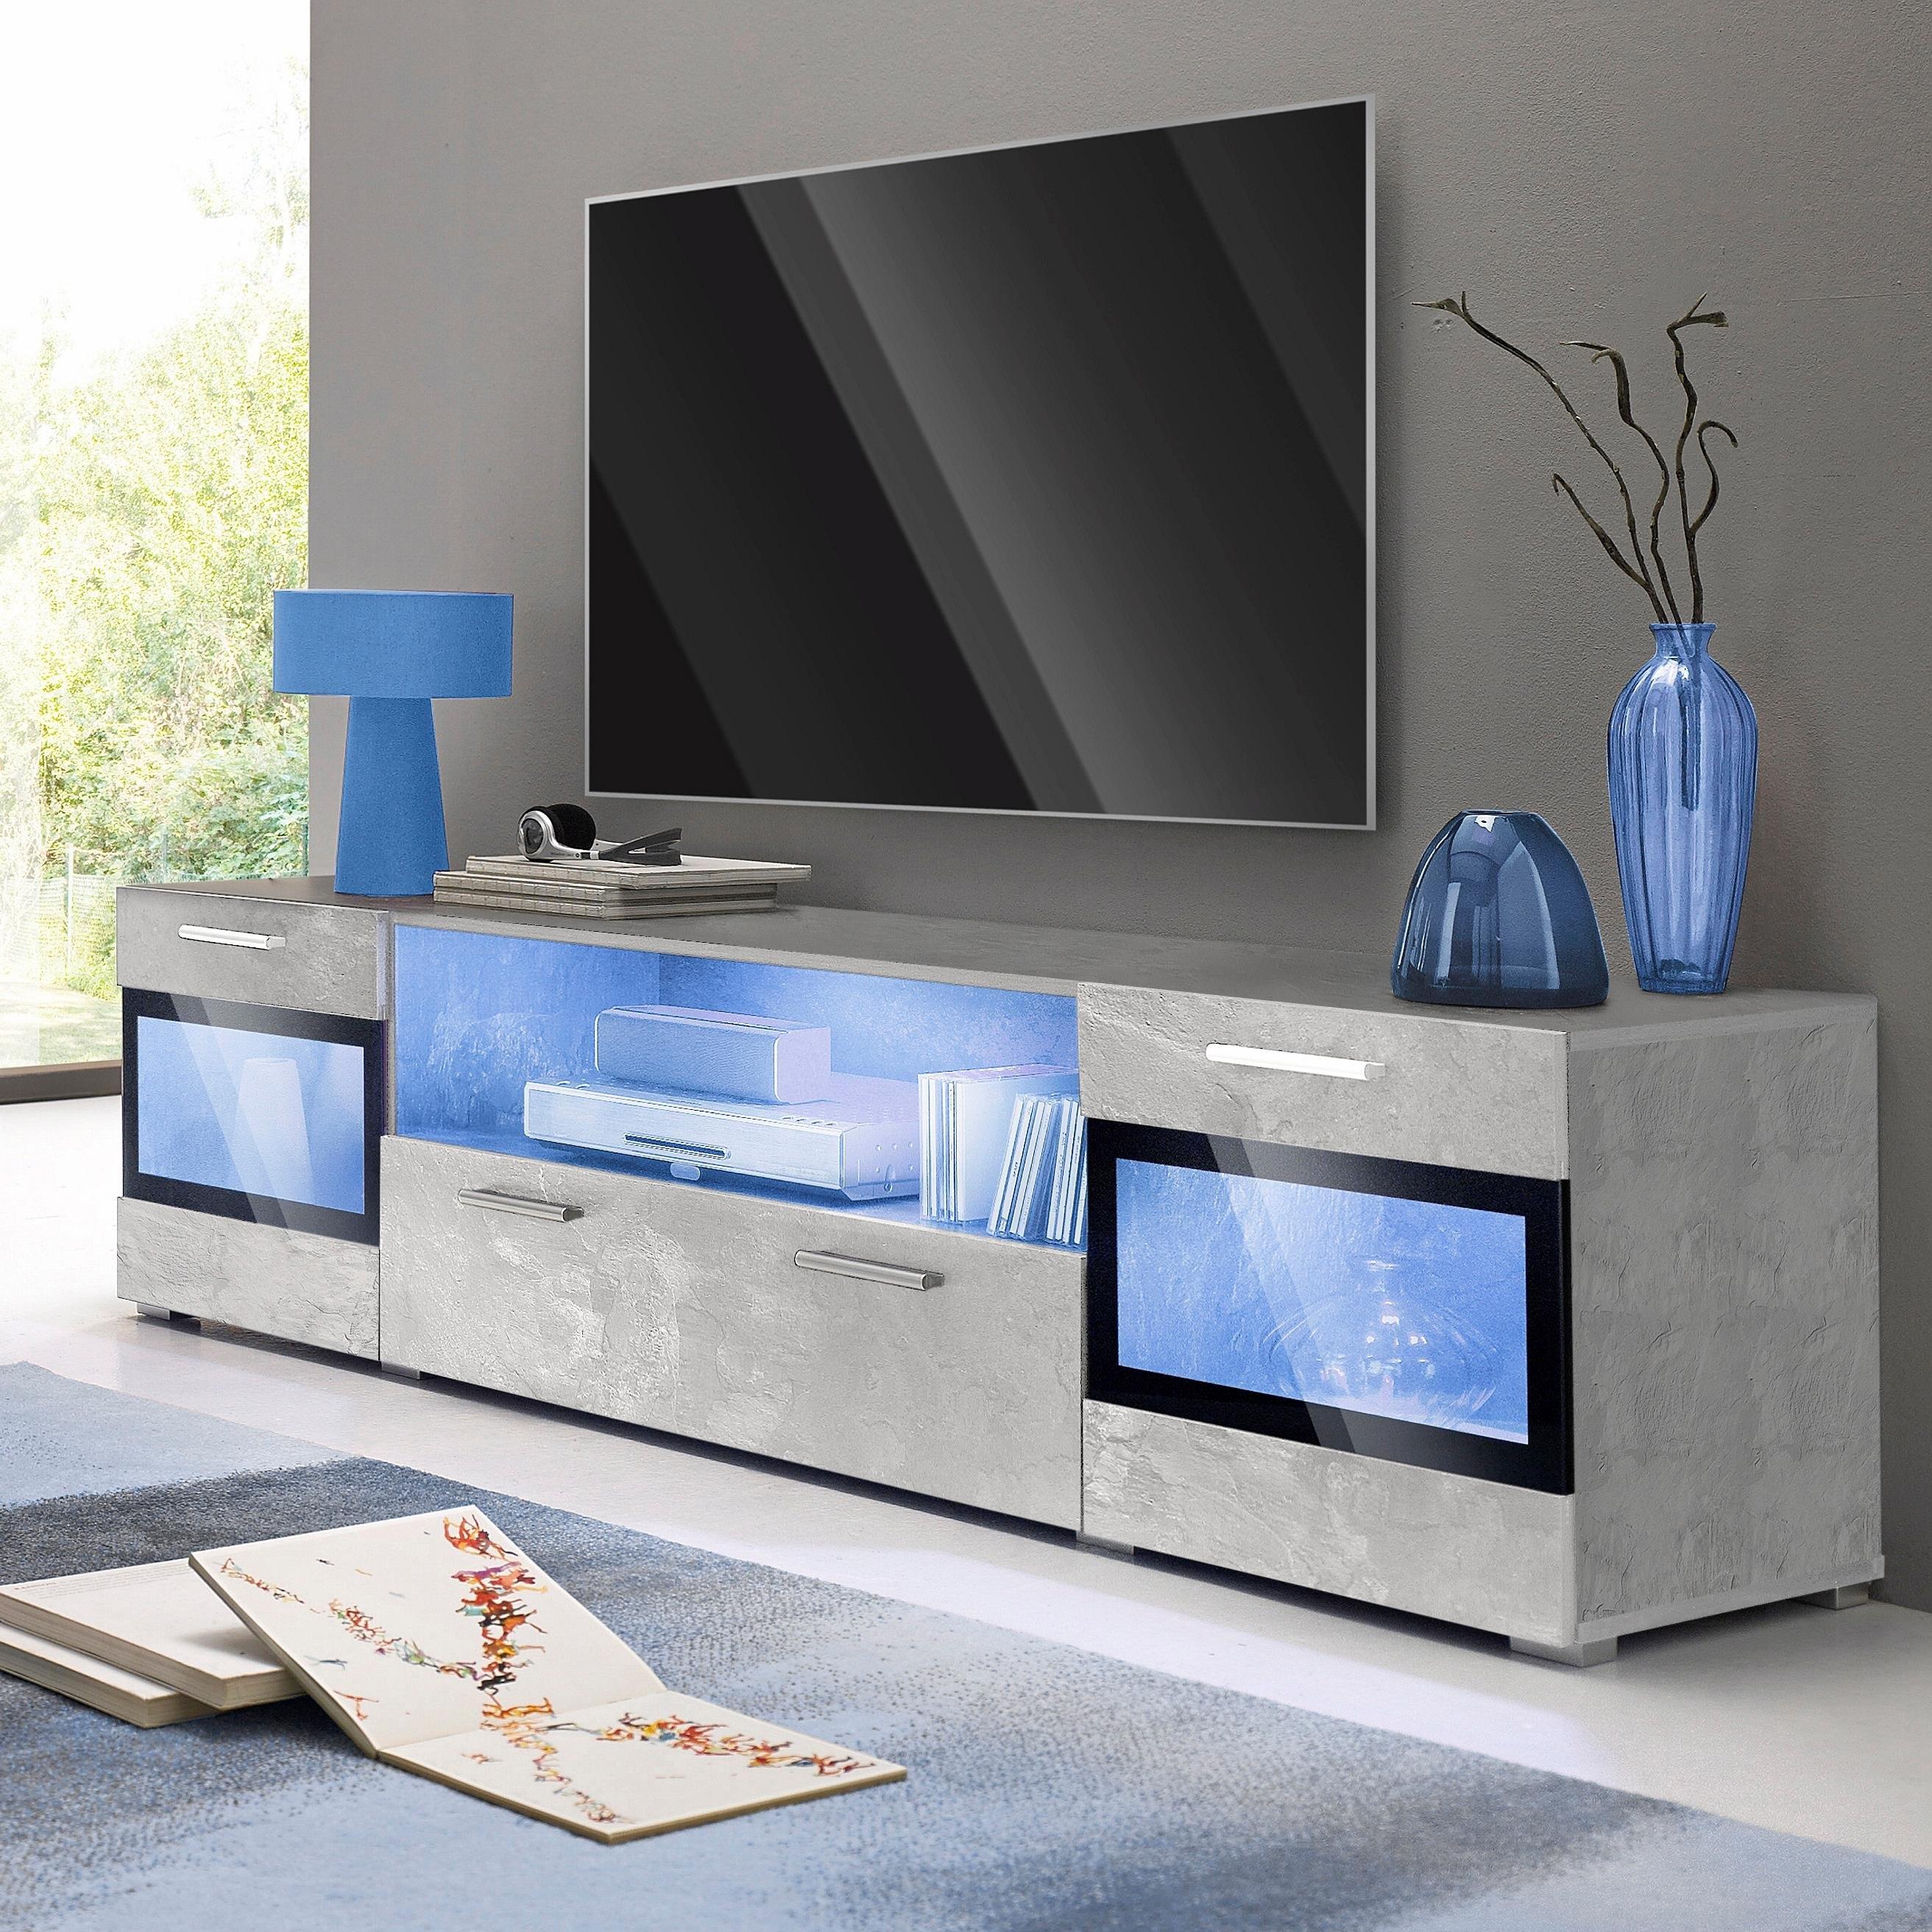 TRENDMANUFAKTUR tv-meubel Sarah Breedte 182 cm online kopen op otto.nl